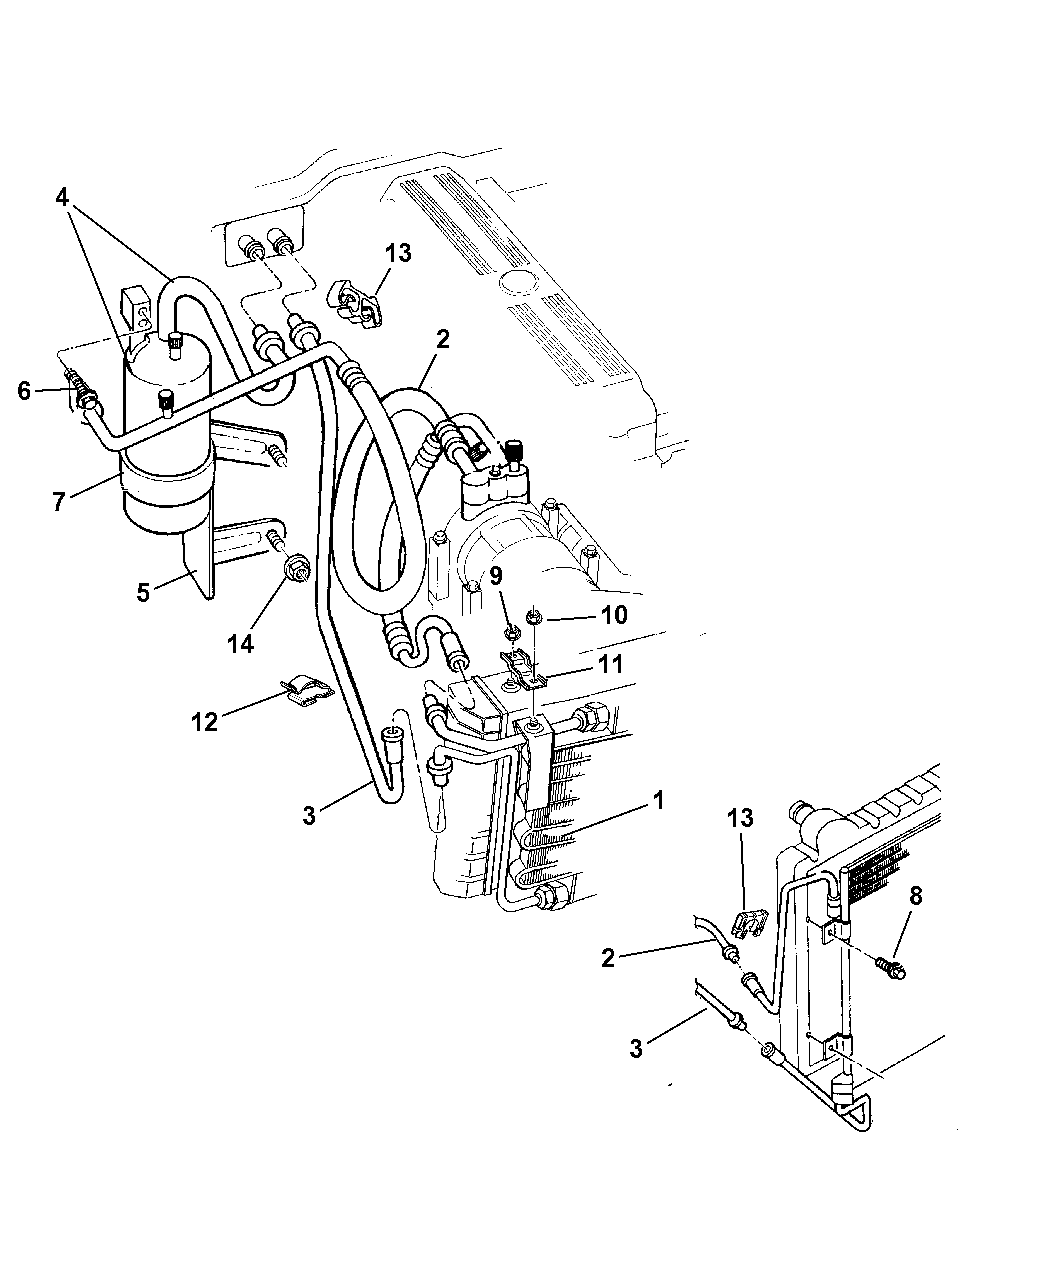 1999 Jeep Cherokee Plumbing - A/C - Mopar Parts Giant